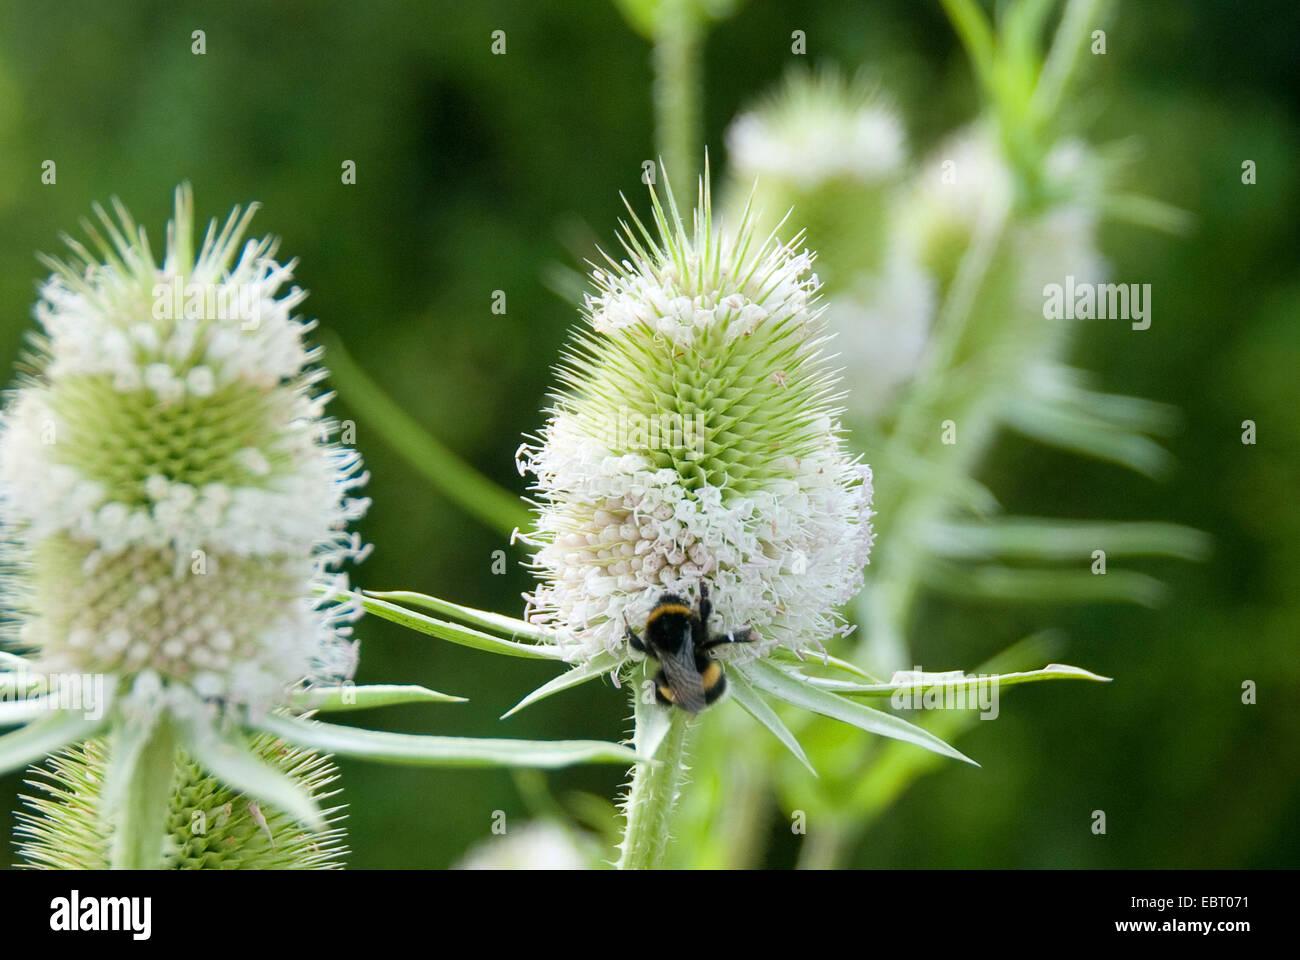 wild teasel, Fuller's teasel, common teasel, common teazle (Dipsacus fullonum, Dipsacus sylvestris), inflorescence - Stock Image